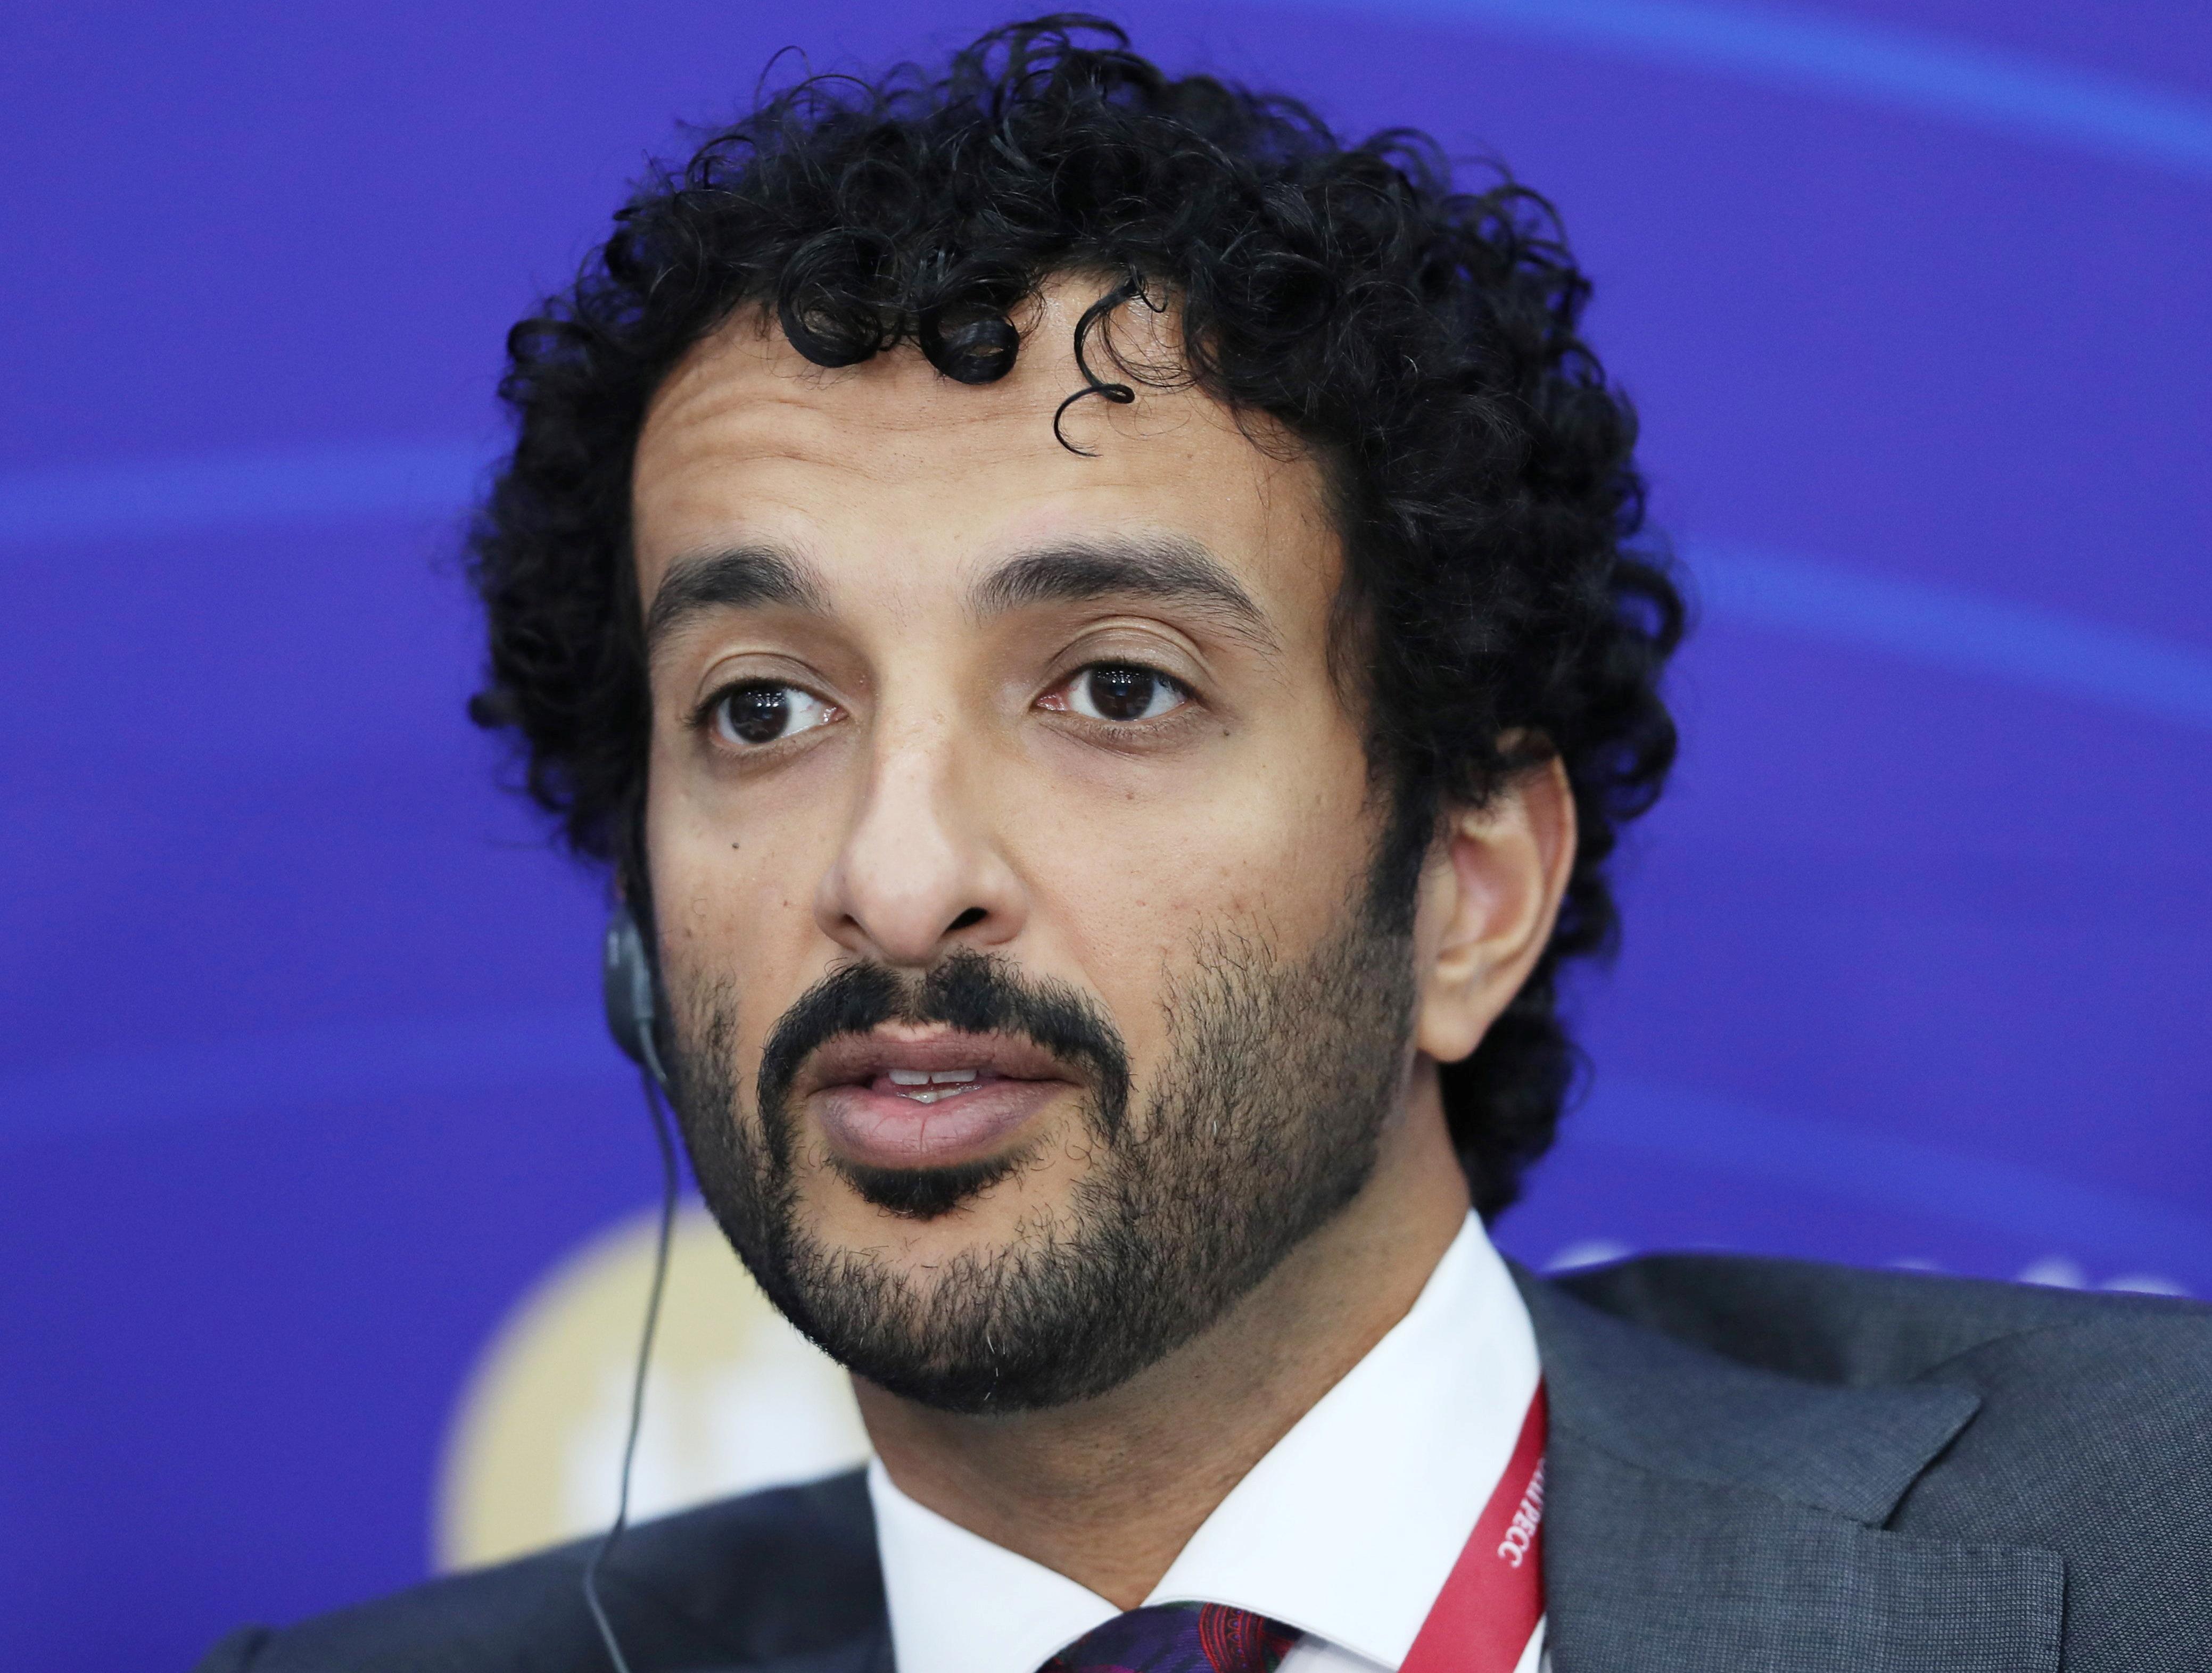 Abdulla Bin Touq Al Marri, Minister of Economy of the United Arab Emirates, attends a session of the St. Petersburg International Economic Forum (SPIEF) in Saint Petersburg, Russia, June 3, 2021. REUTERS/Evgenia Novozhenina/File photo